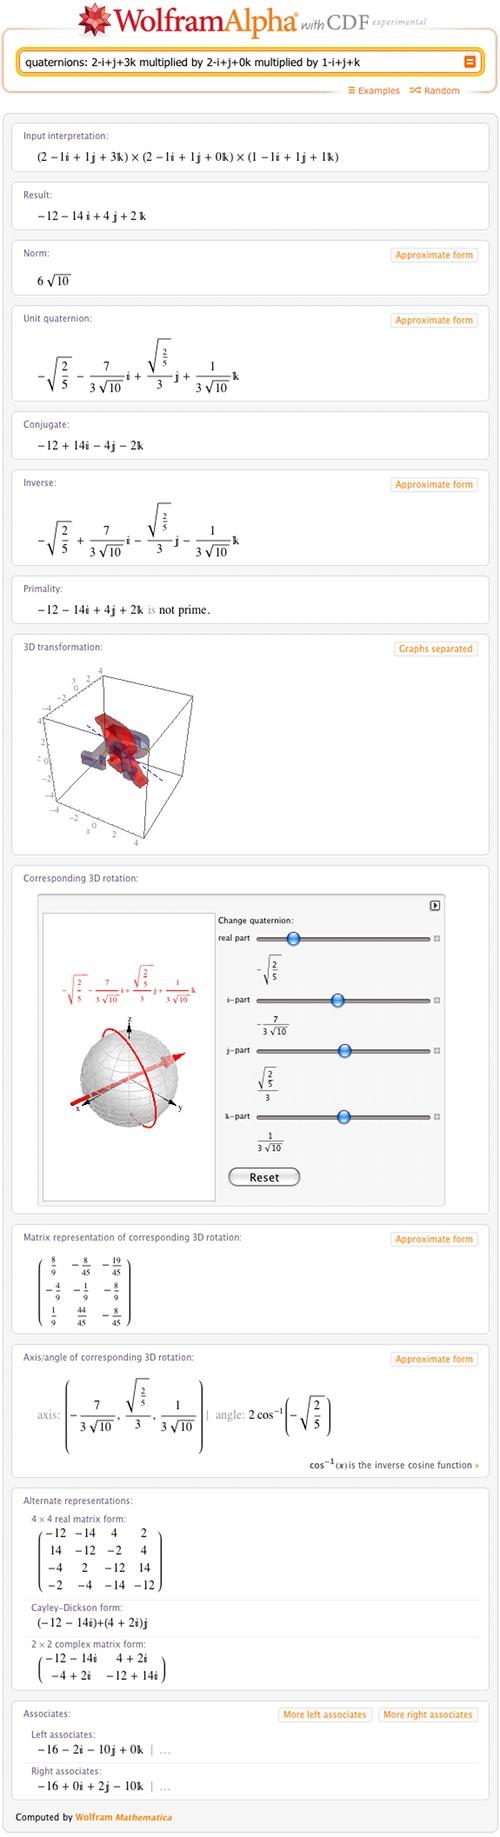 quaternions: 2-i+j+3k multiplied by 2-i+j+0k multiplied by 1-i+j+k